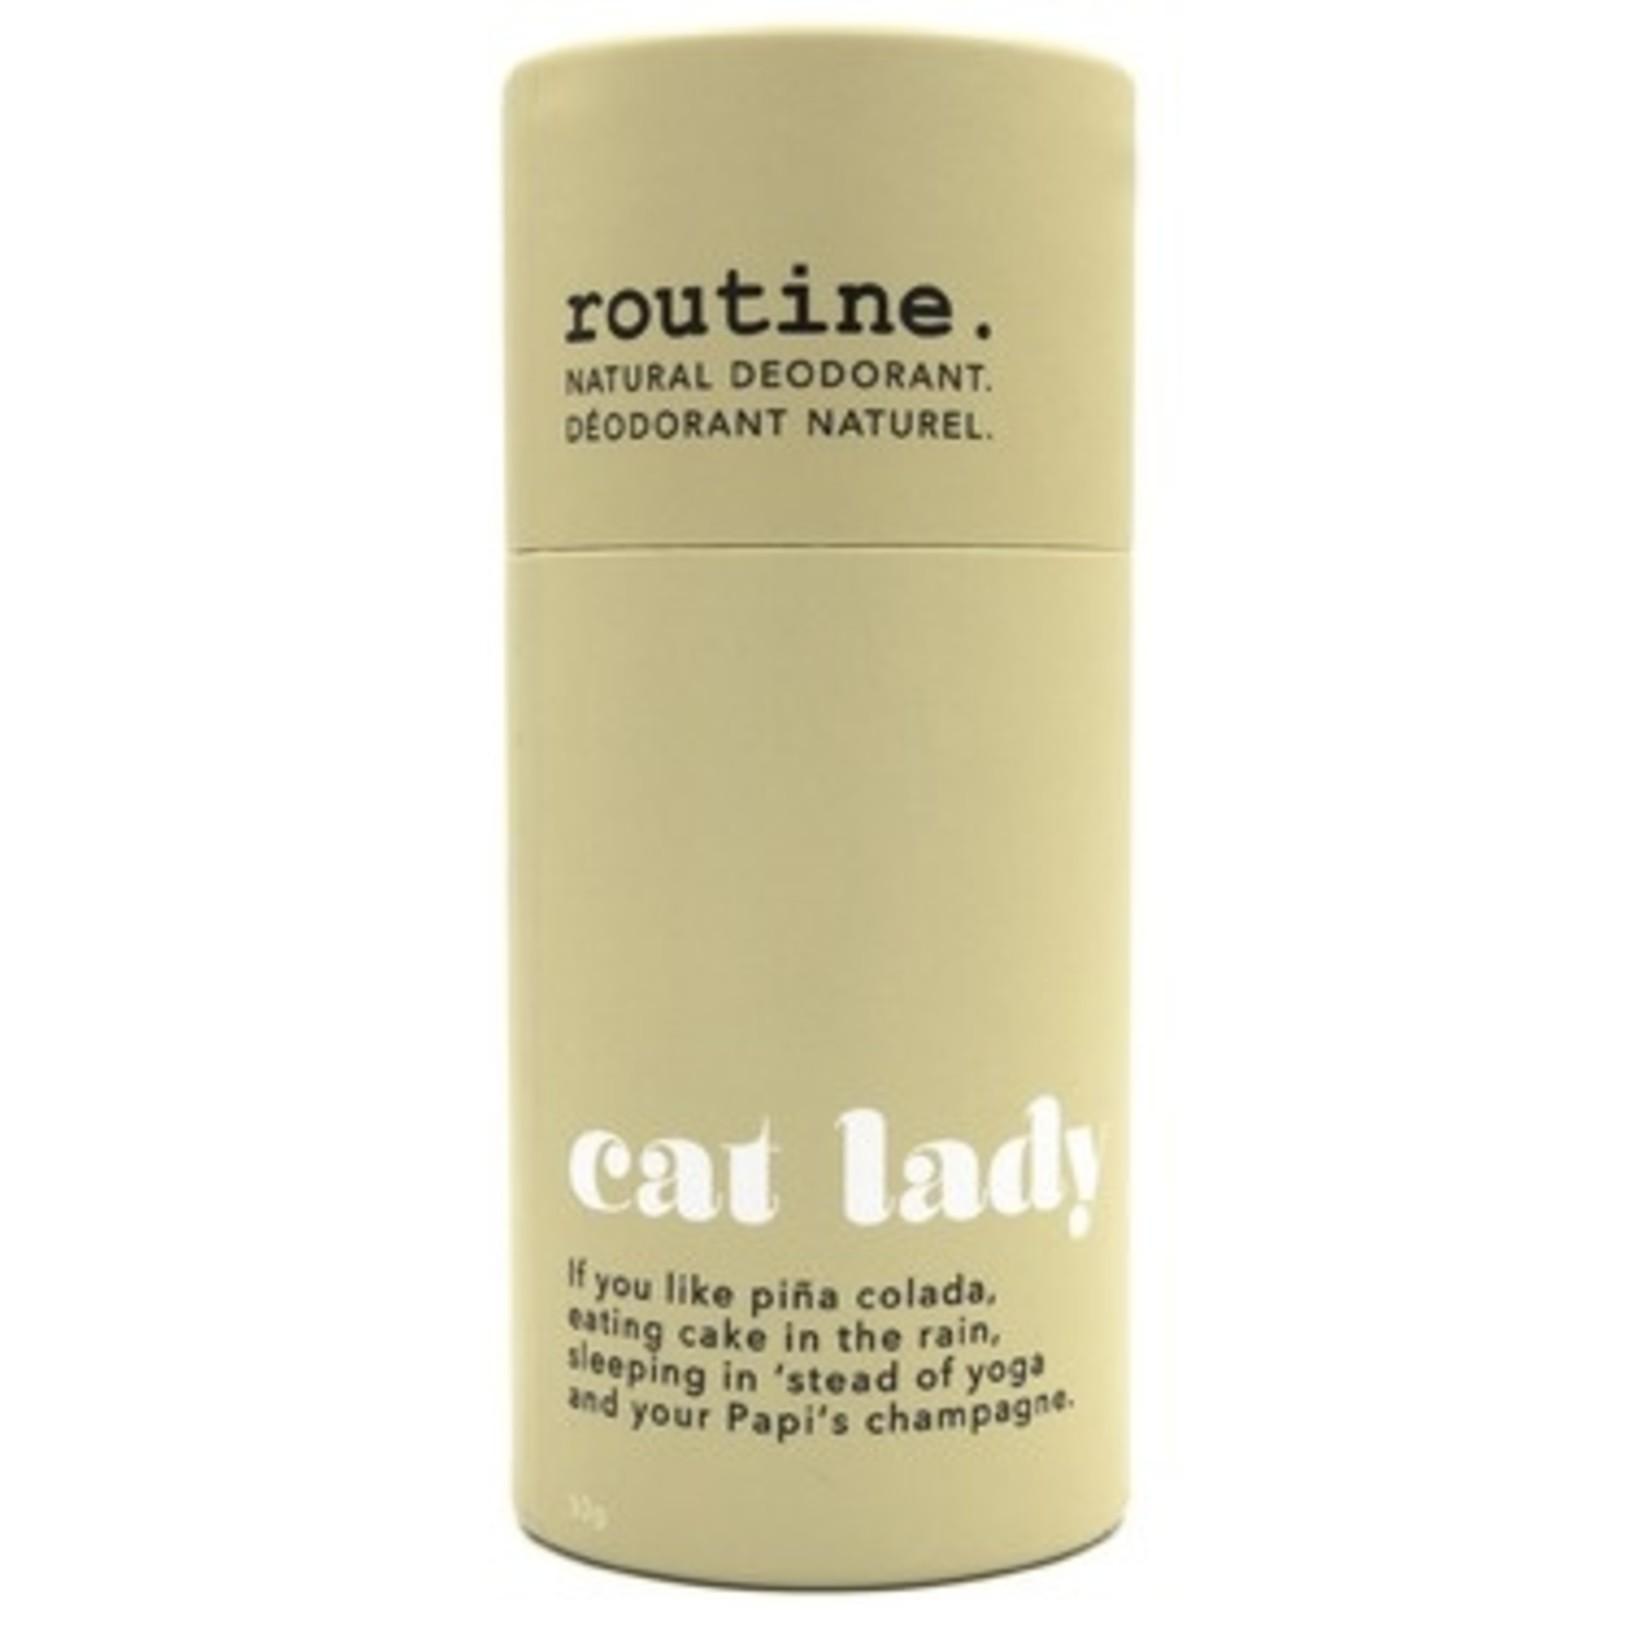 Routine Routine Cat Lady Deodorant Stick 50g